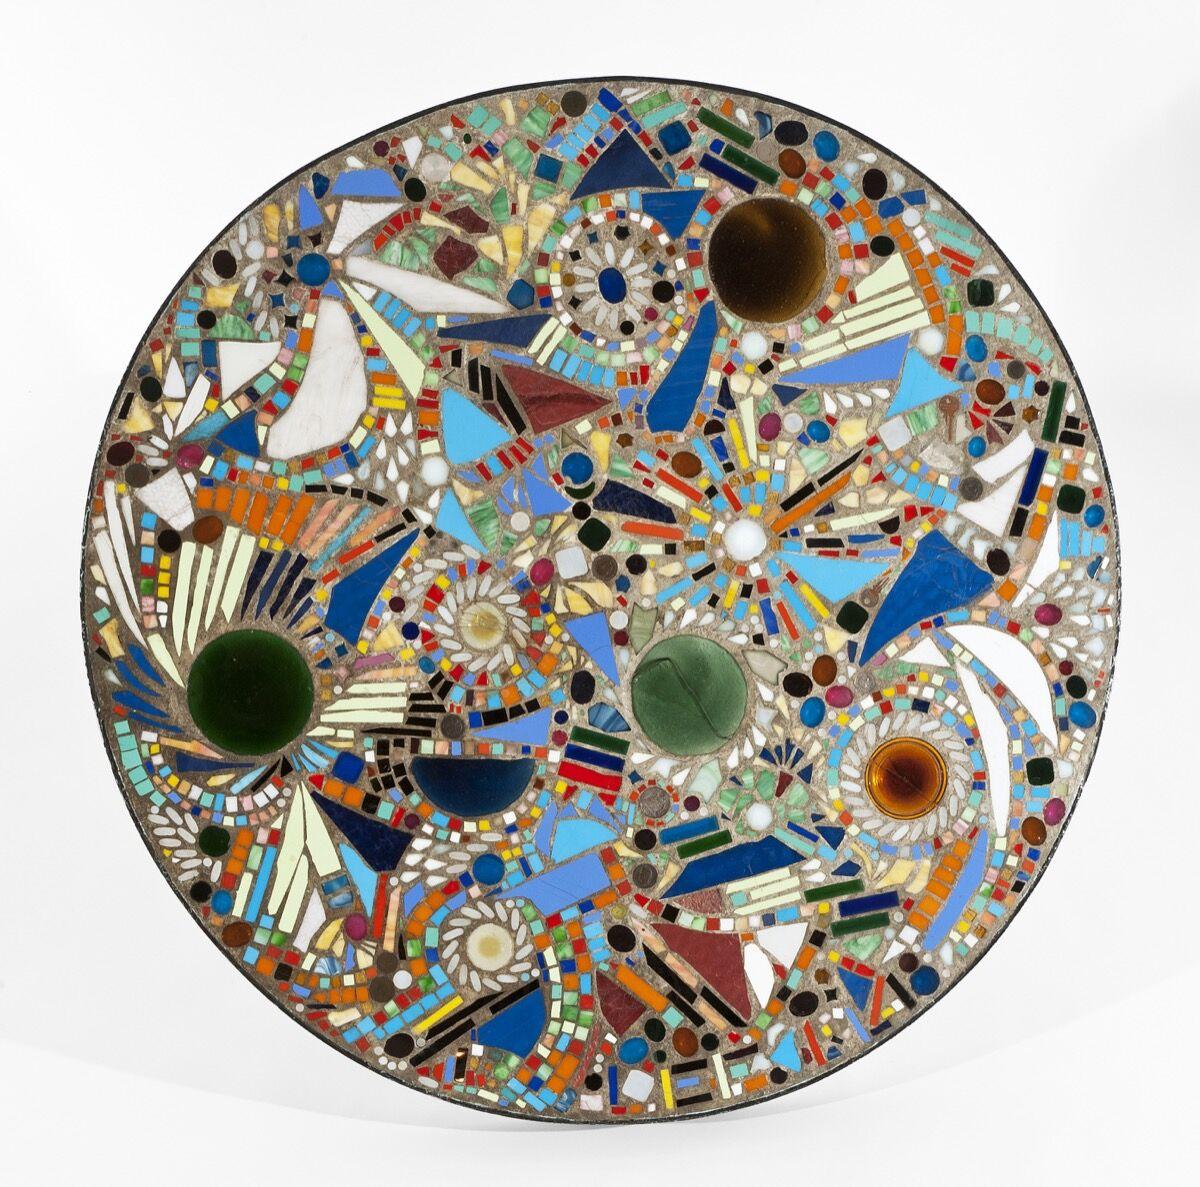 Lee Krasner, Mosaic Table, 1947. © The Pollock-Krasner Foundation. Courtesy of Michael Rosenfeld Gallery LLC, New York.